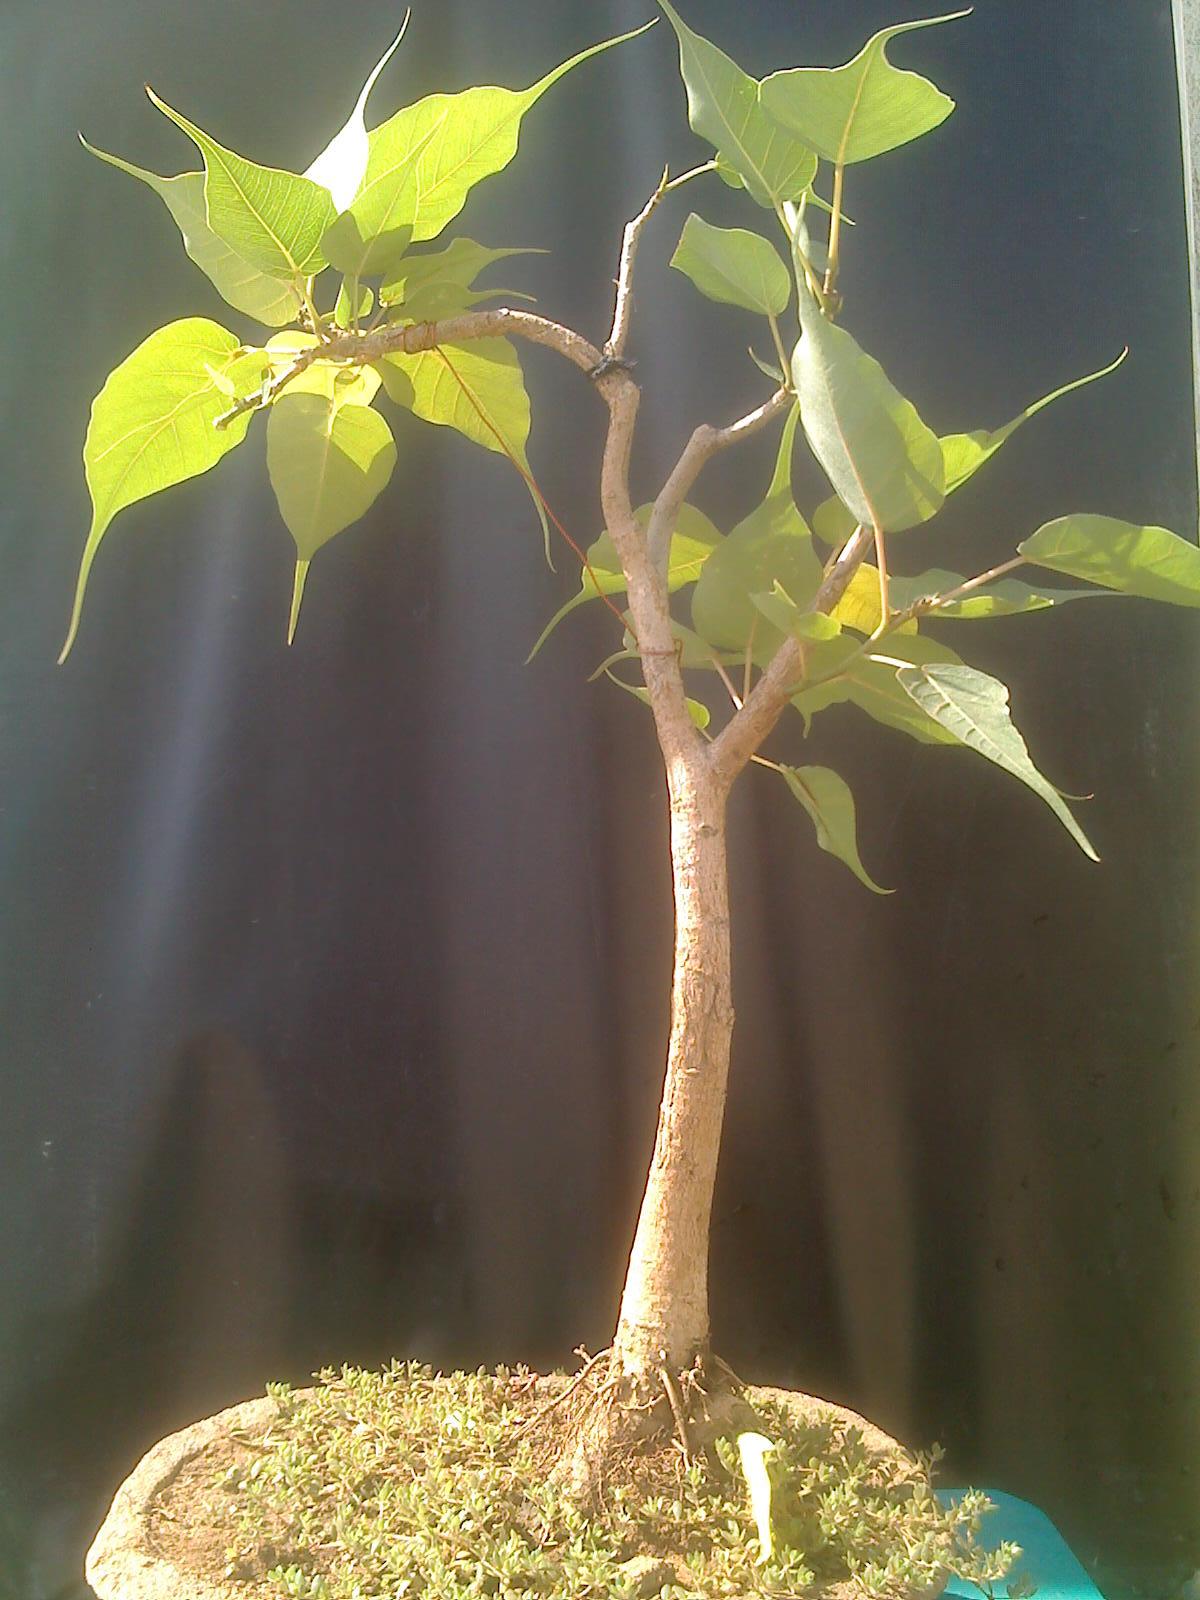 Solidago Hispida as well Aplectrum Hyemale further Corngermplasm besides  additionally Helichrysum Plicatum Ssp Plicatum. on plant life